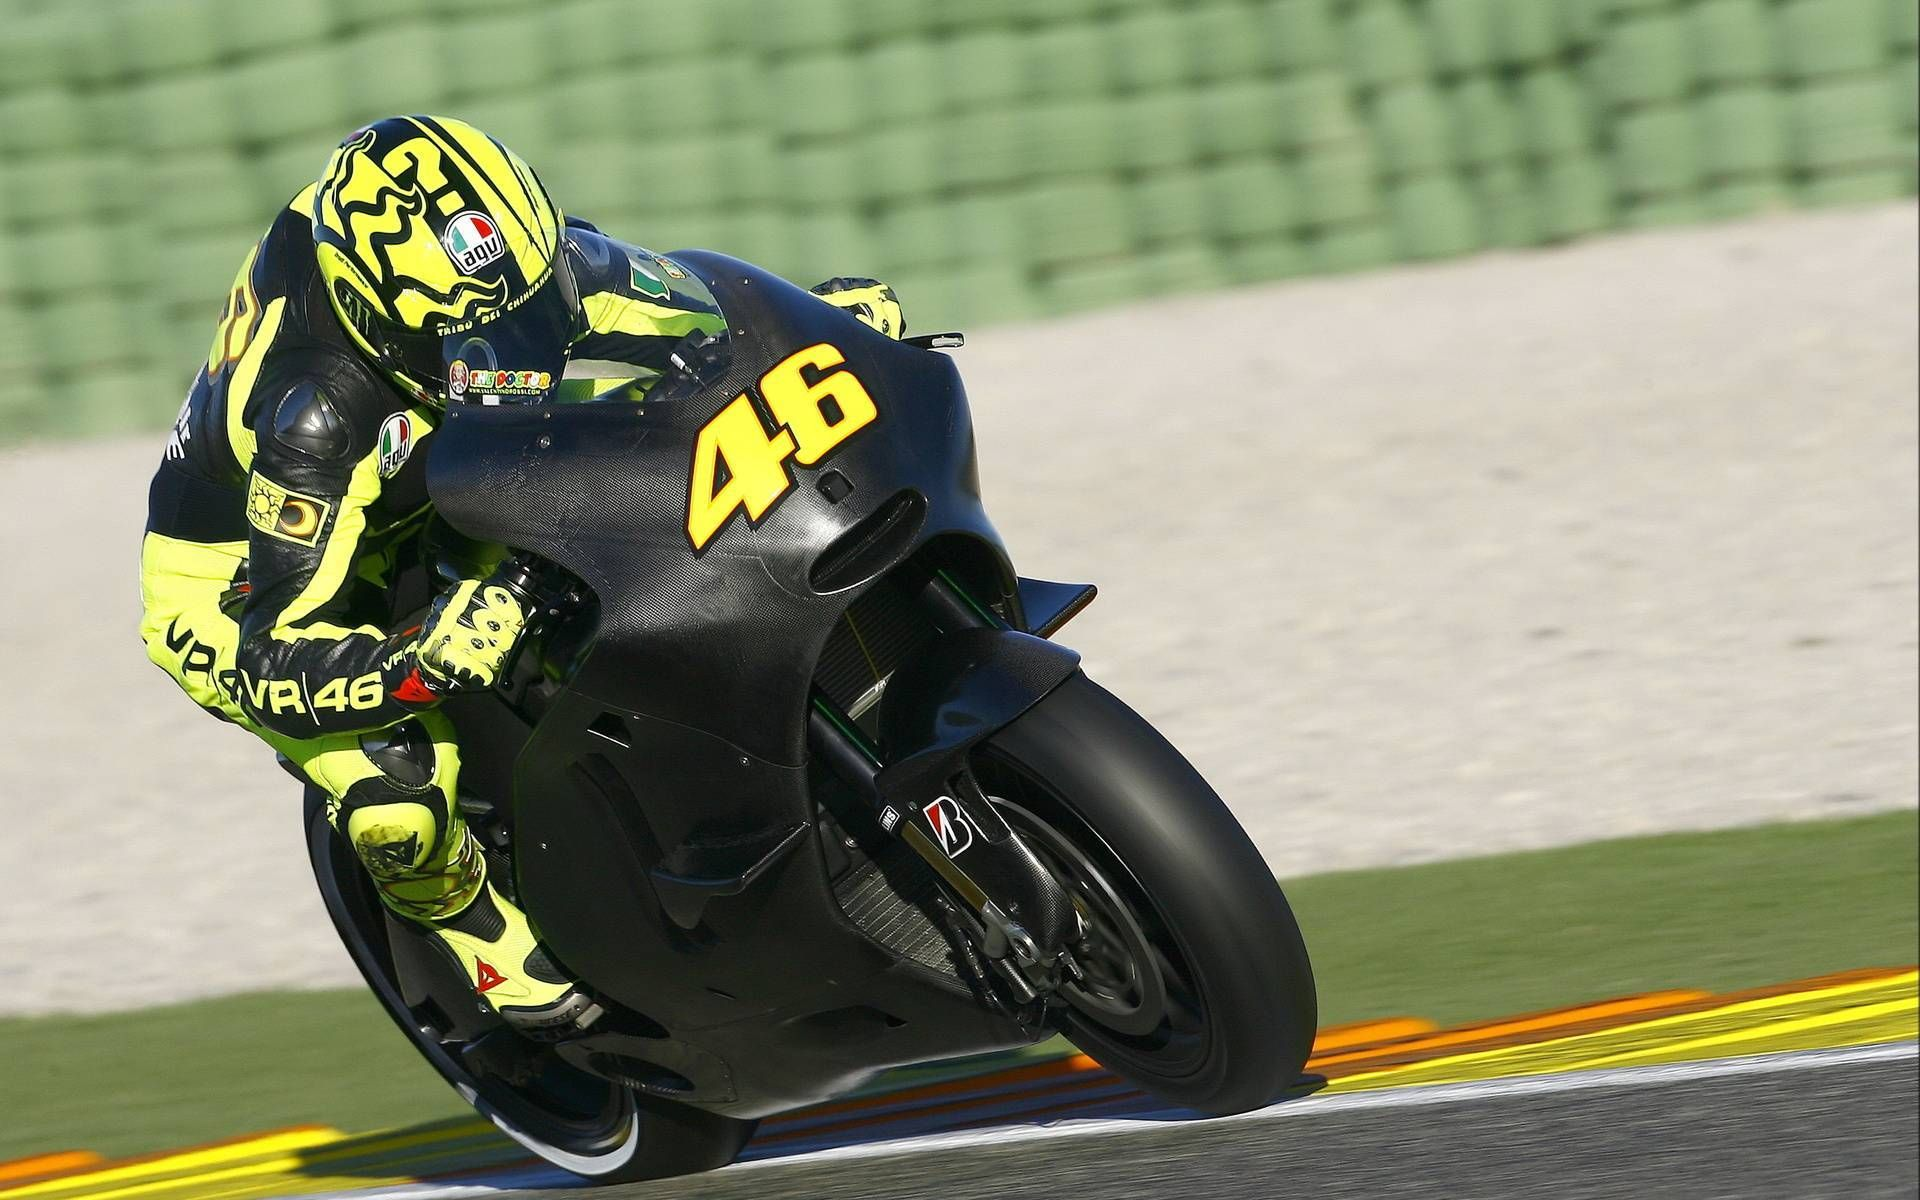 Rossi 46 On Black Bike Wallpaper Motogpic Pinterest Racing